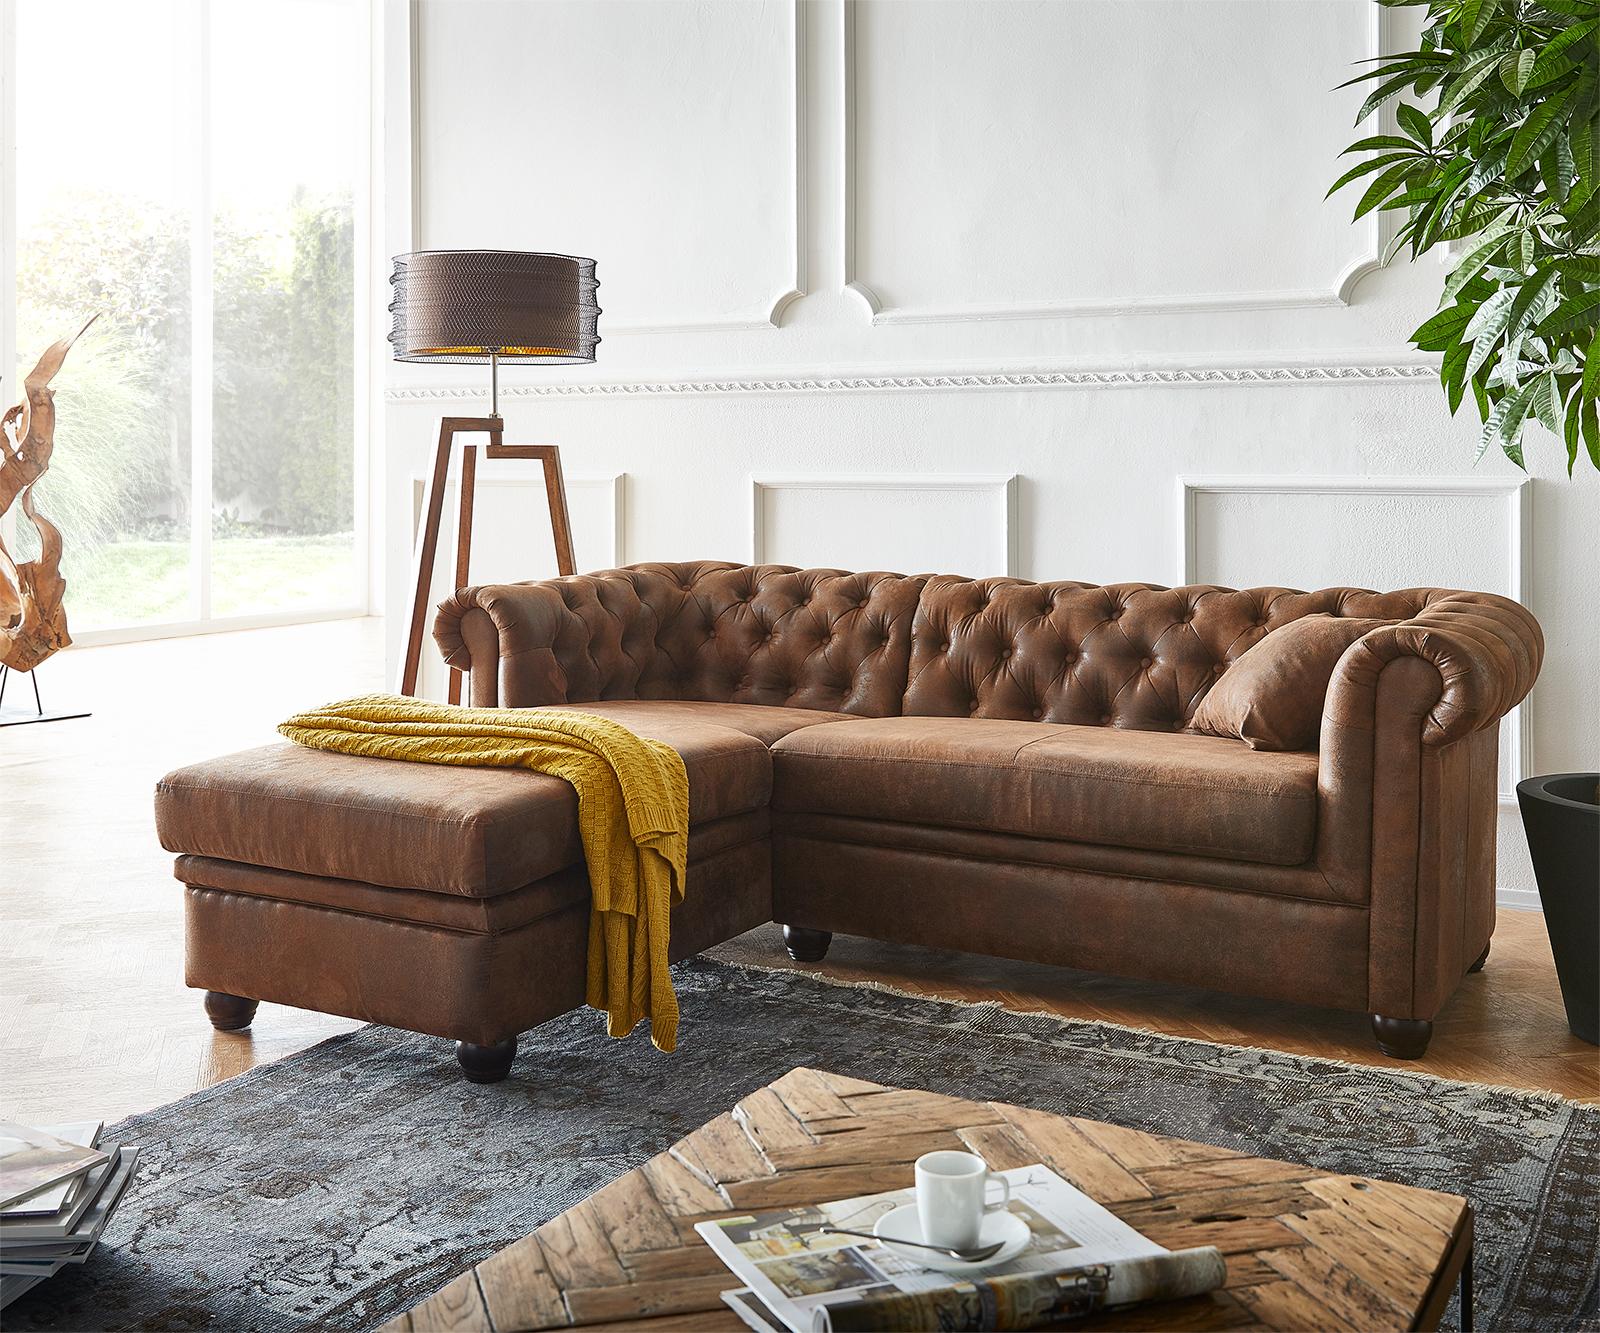 delife-sofa-chesterfield-200x88-cm-braun-abgesteppt-ottomane-links-chesterfields